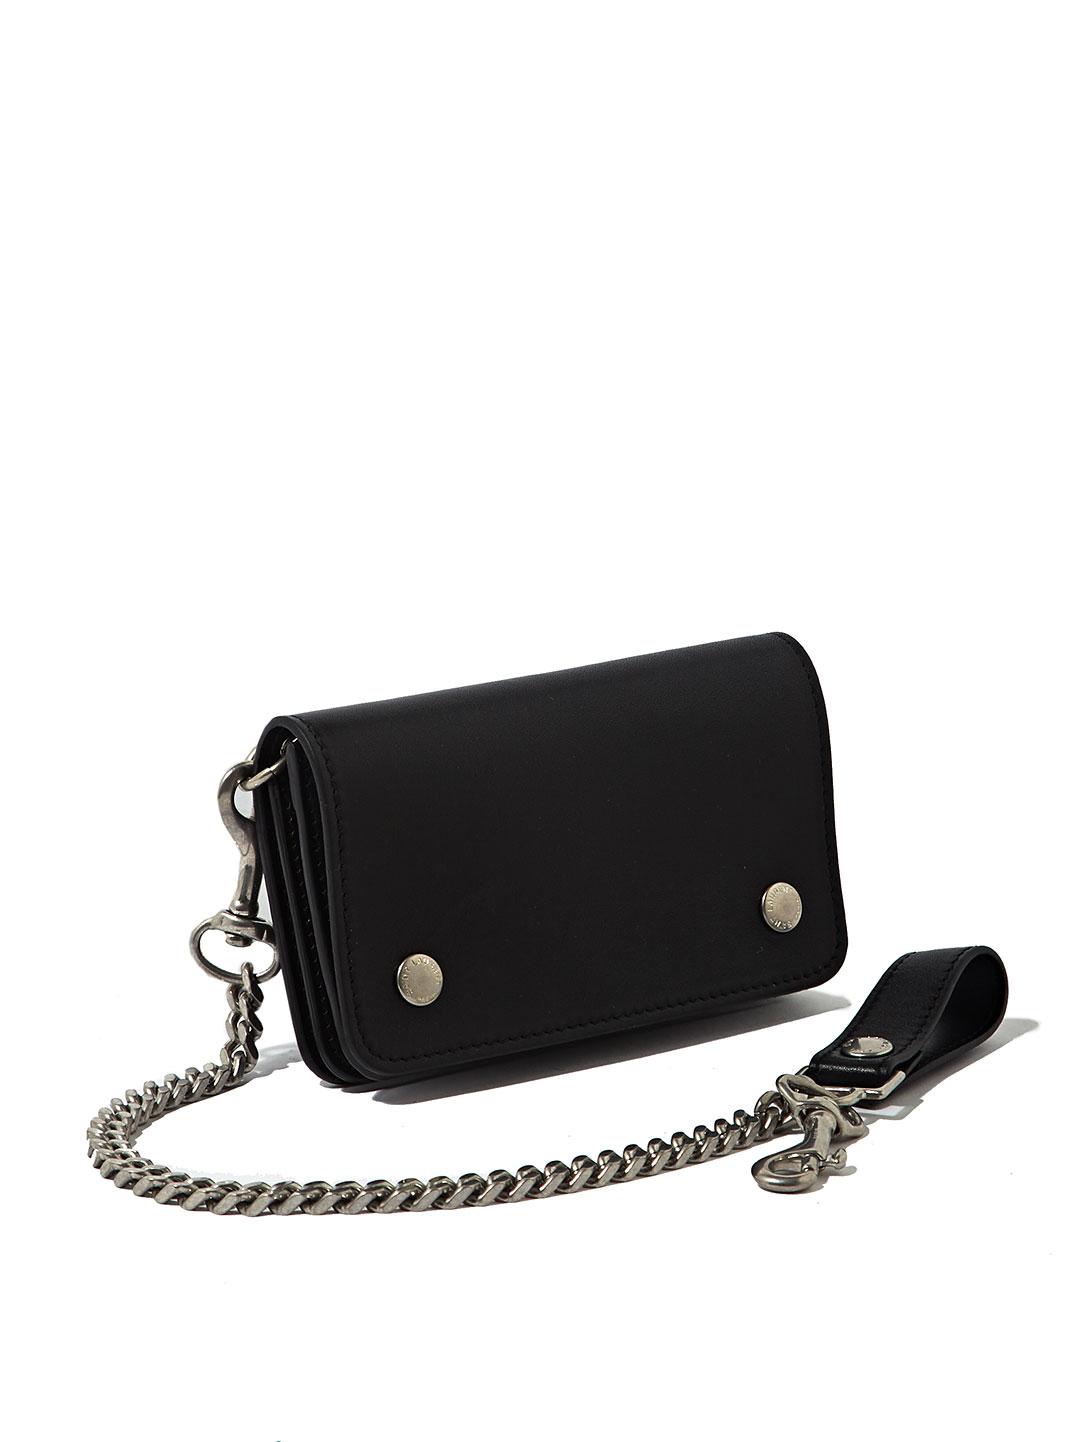 Saint Laurent Mens Leather Pocket Chain Wallet In Black